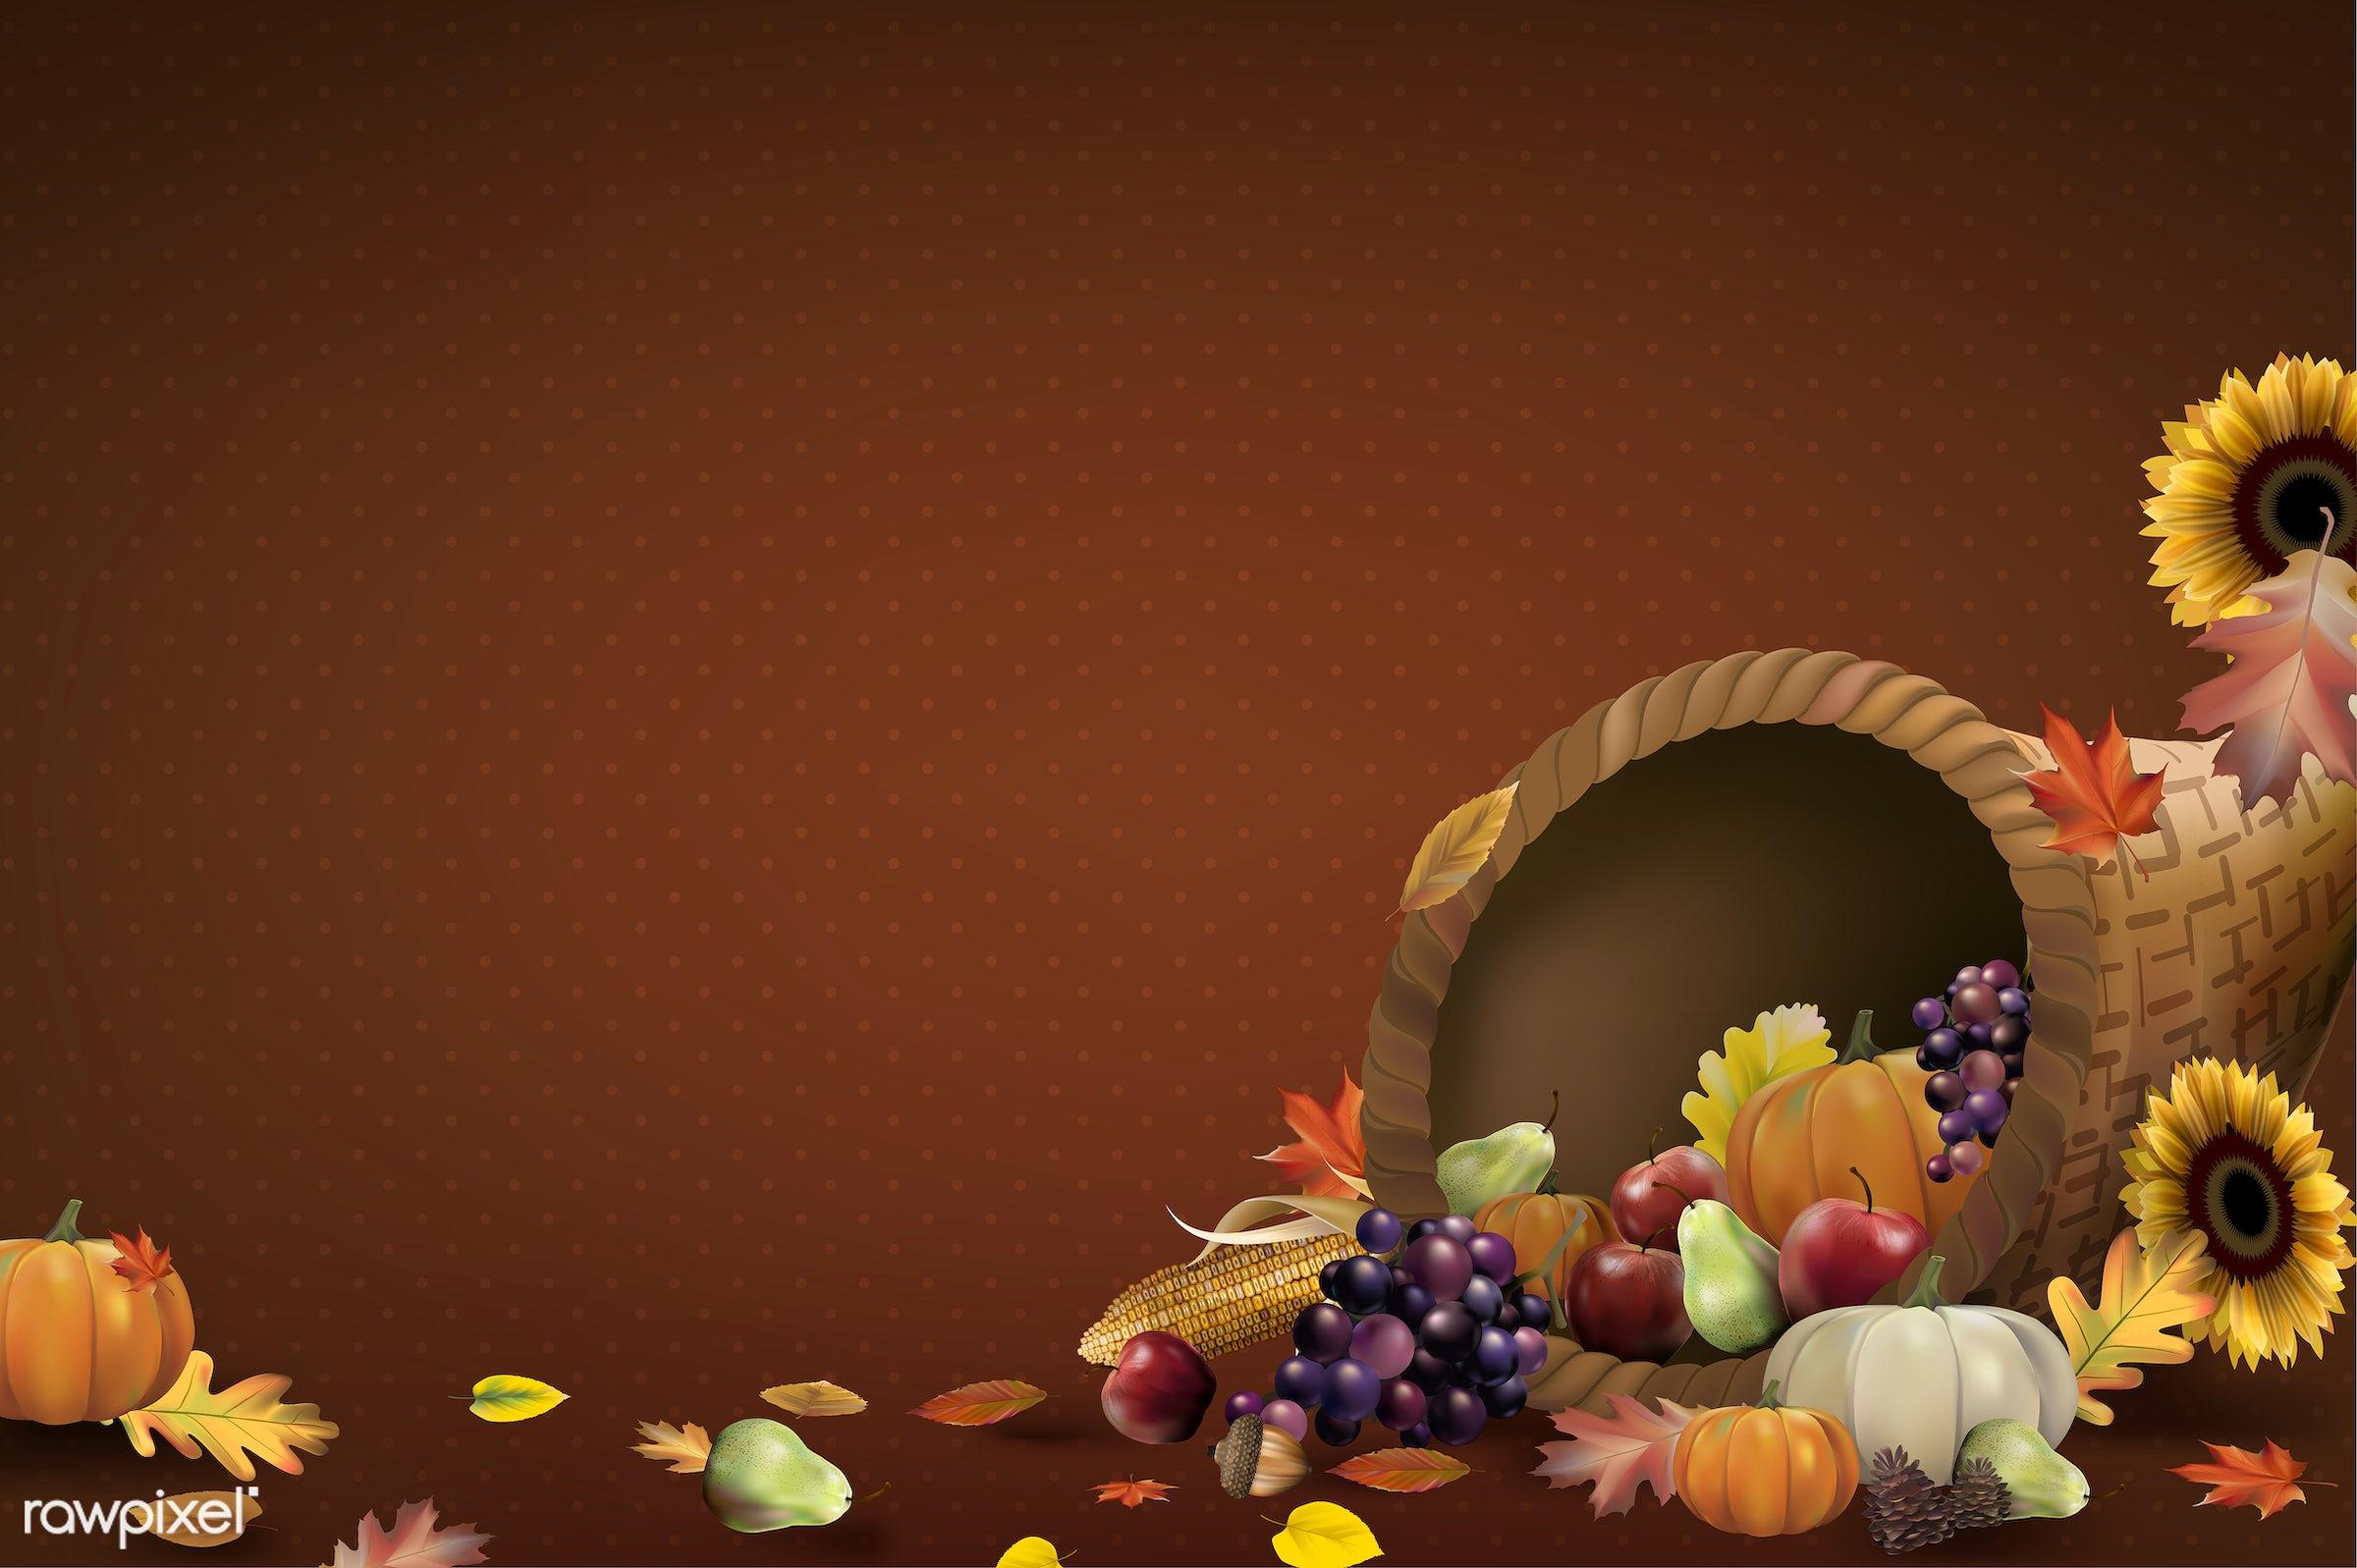 Illustration of thanksgiving festival - vegetable, autumn, background, celebration, copy space, corn, crops, decoration,...